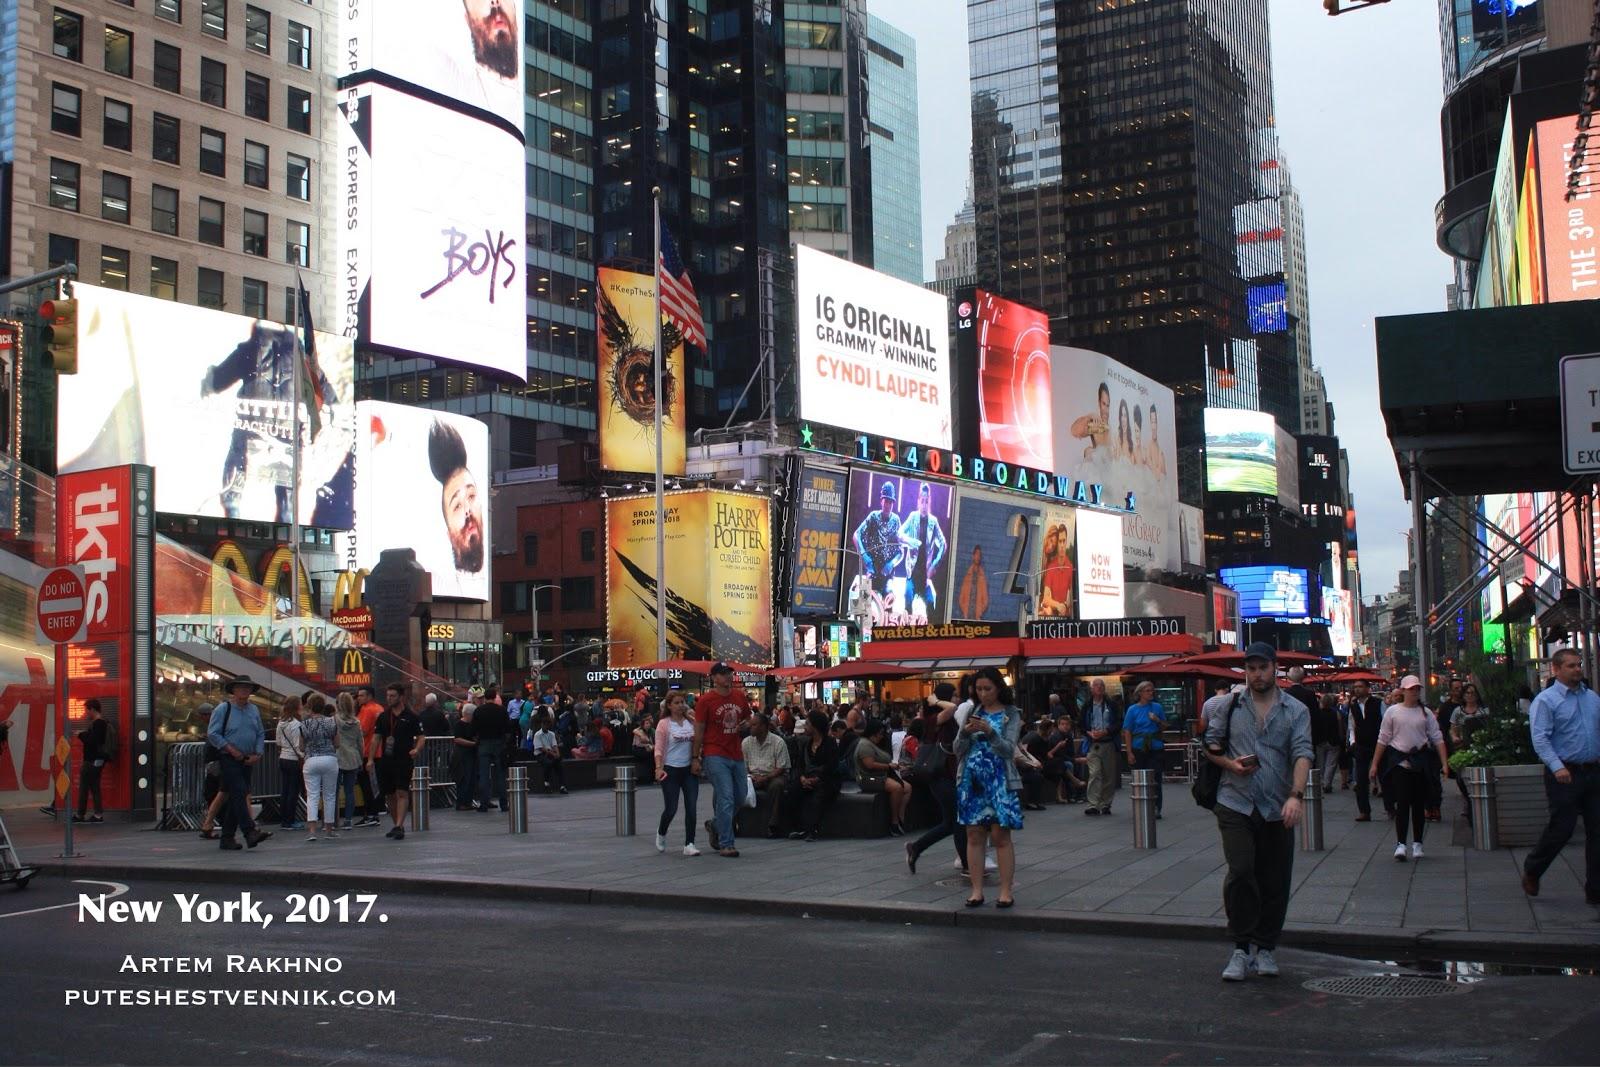 Яркая реклама на Таймс-Сквер